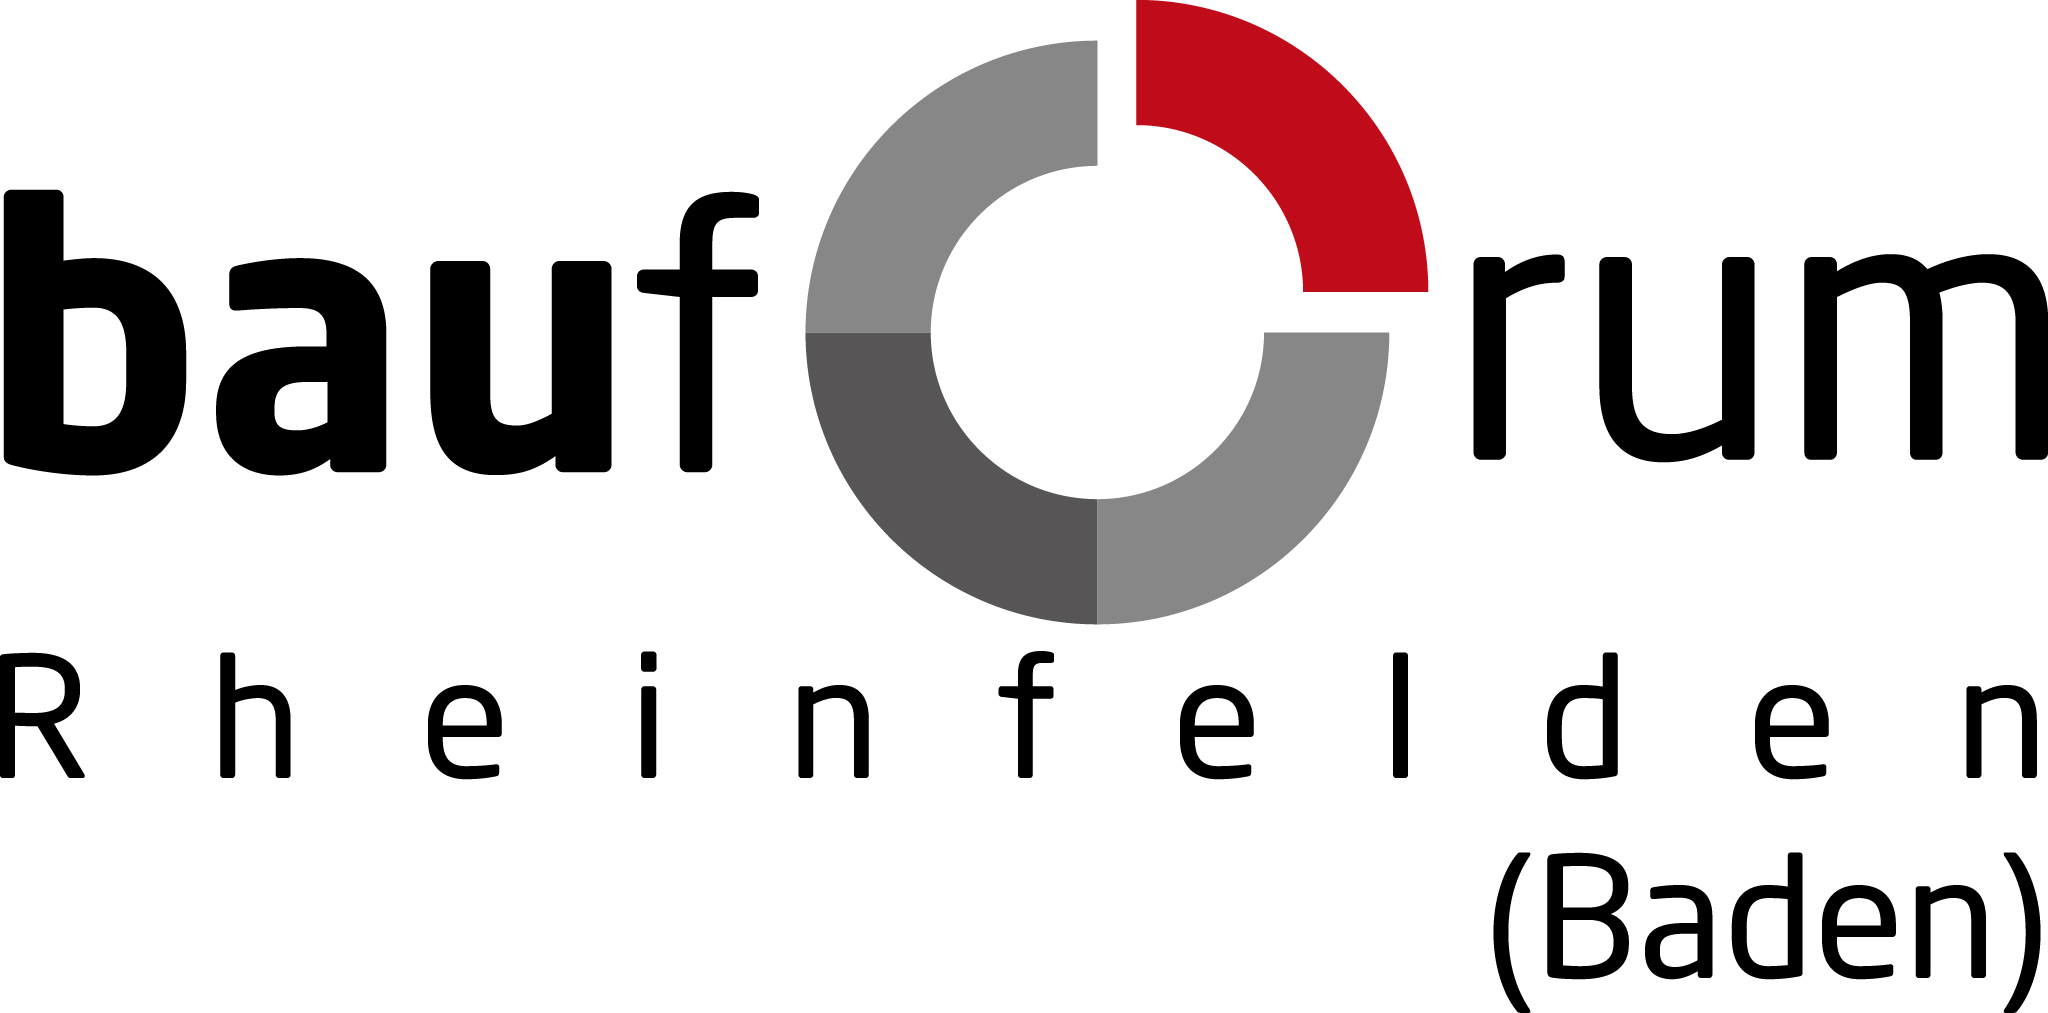 Bauforum Rheinfelden